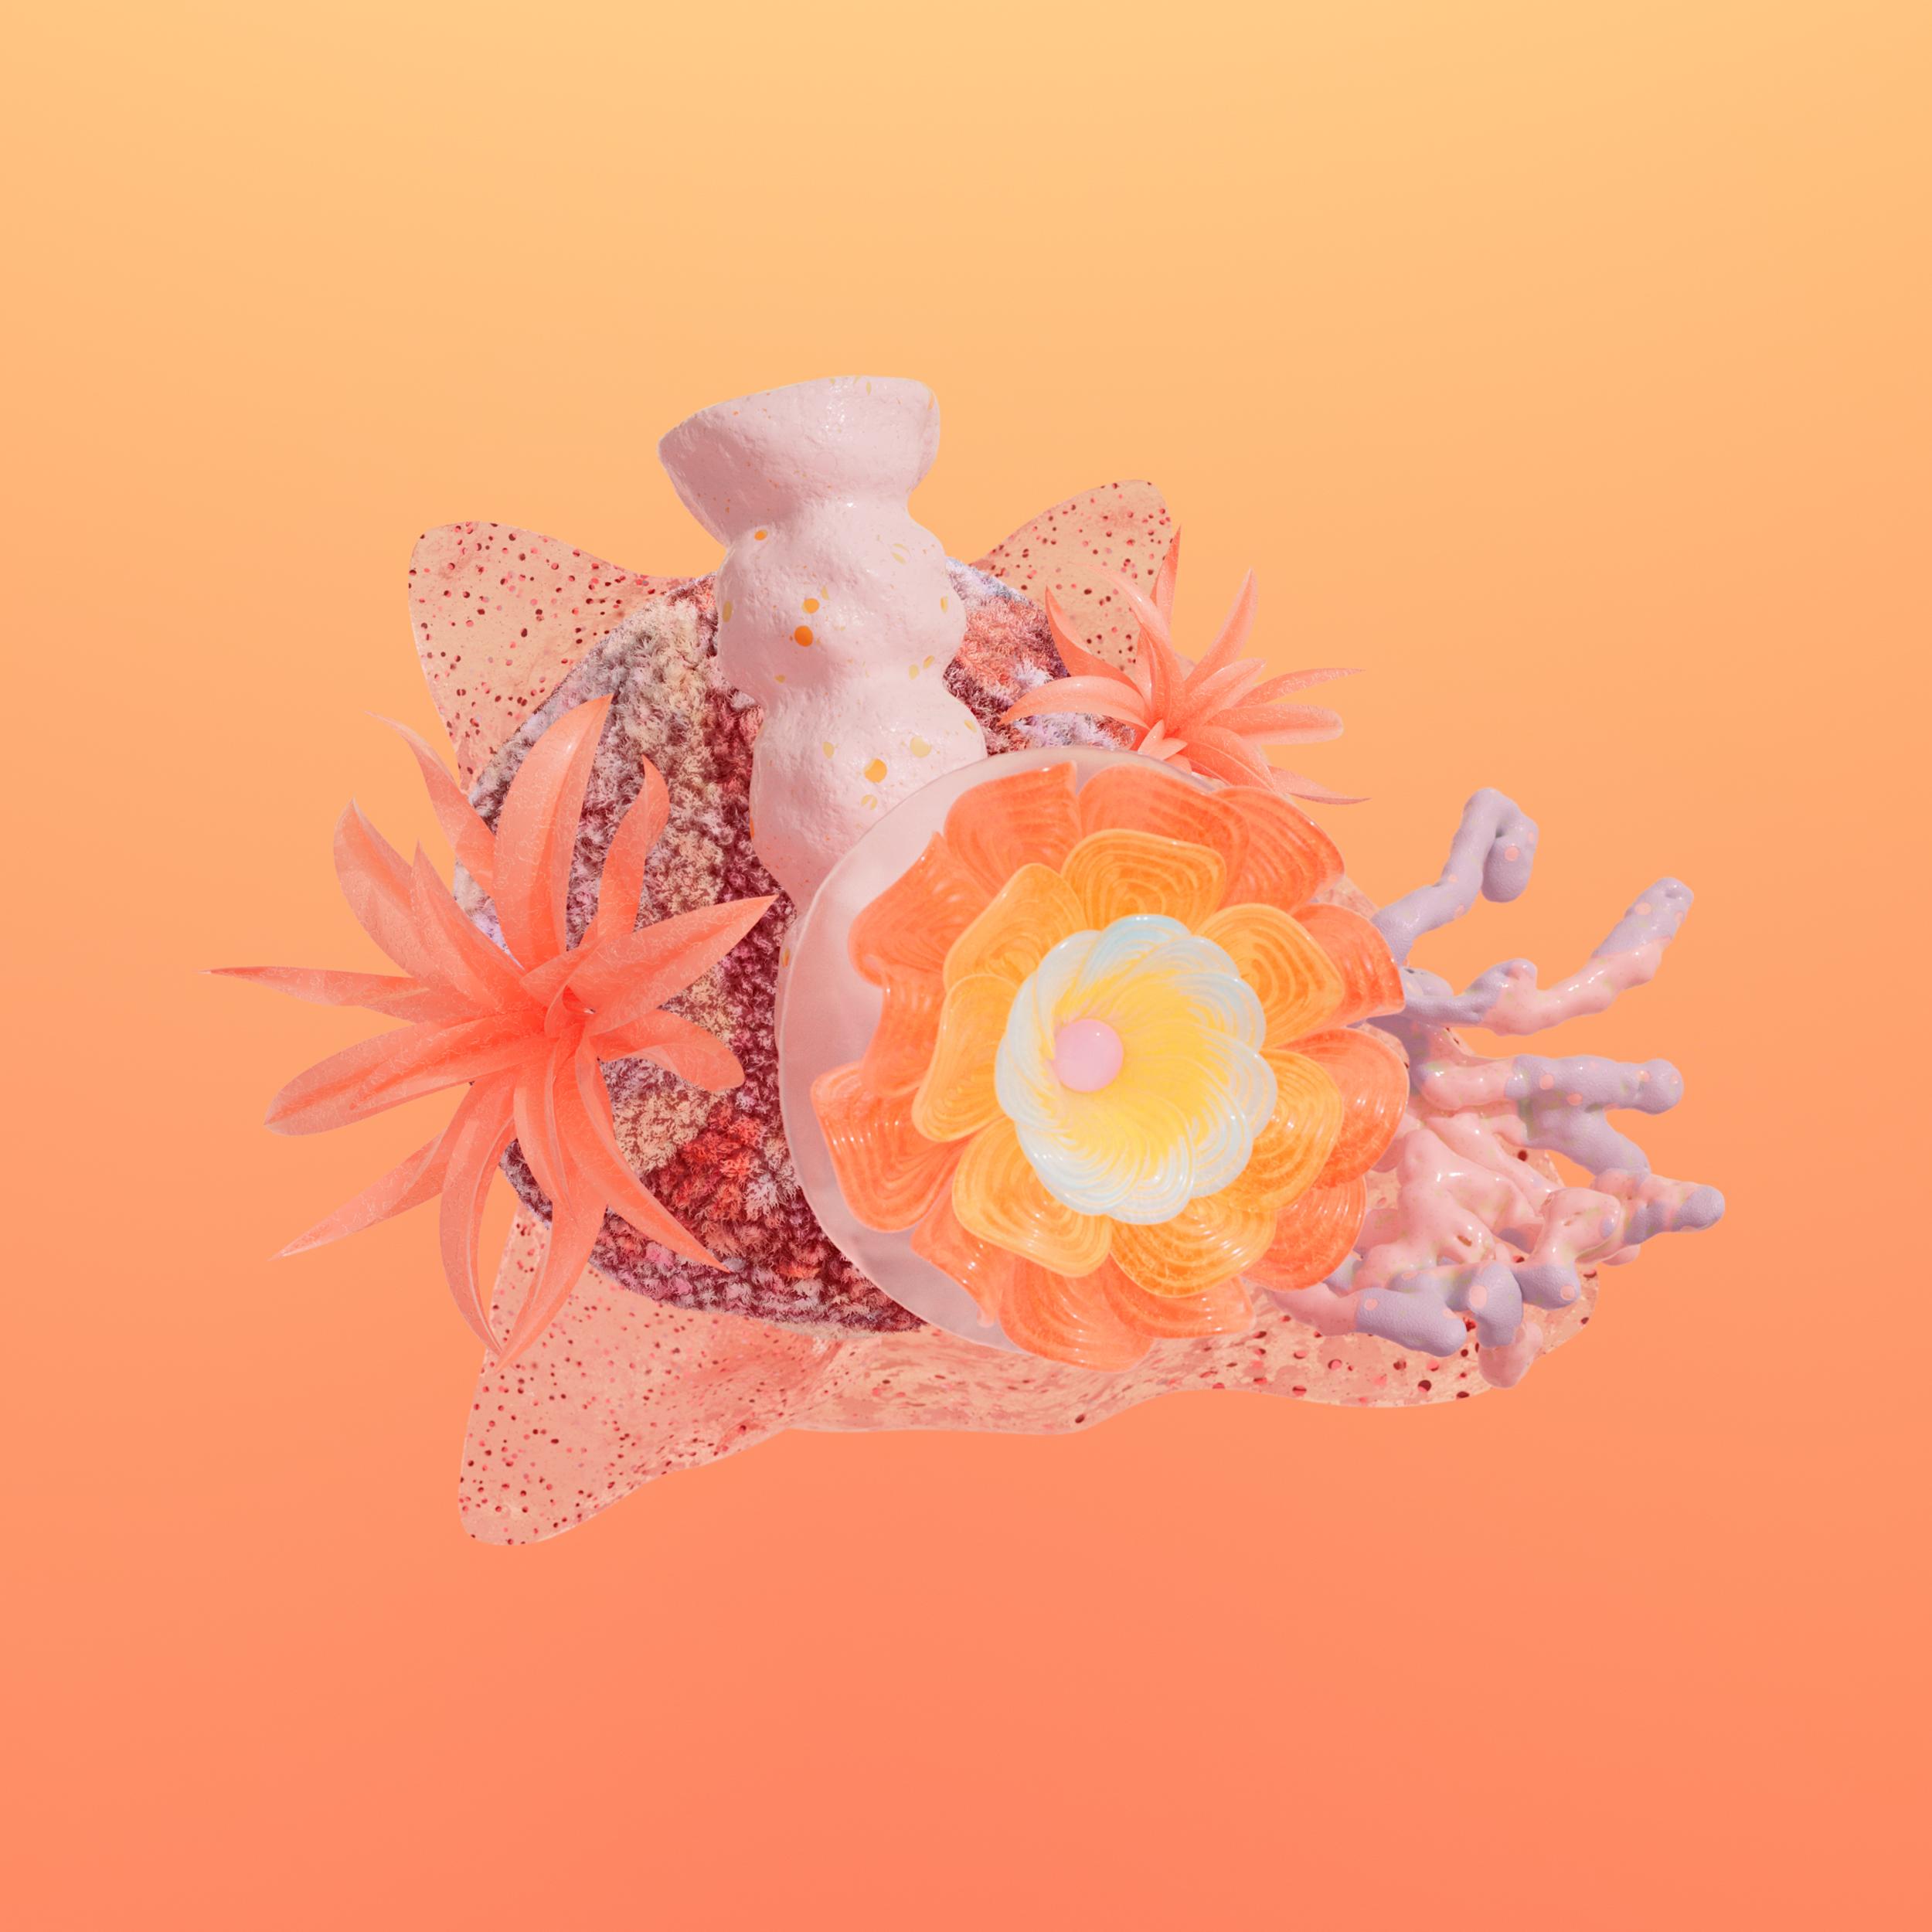 Bloom_D_04_fog0001